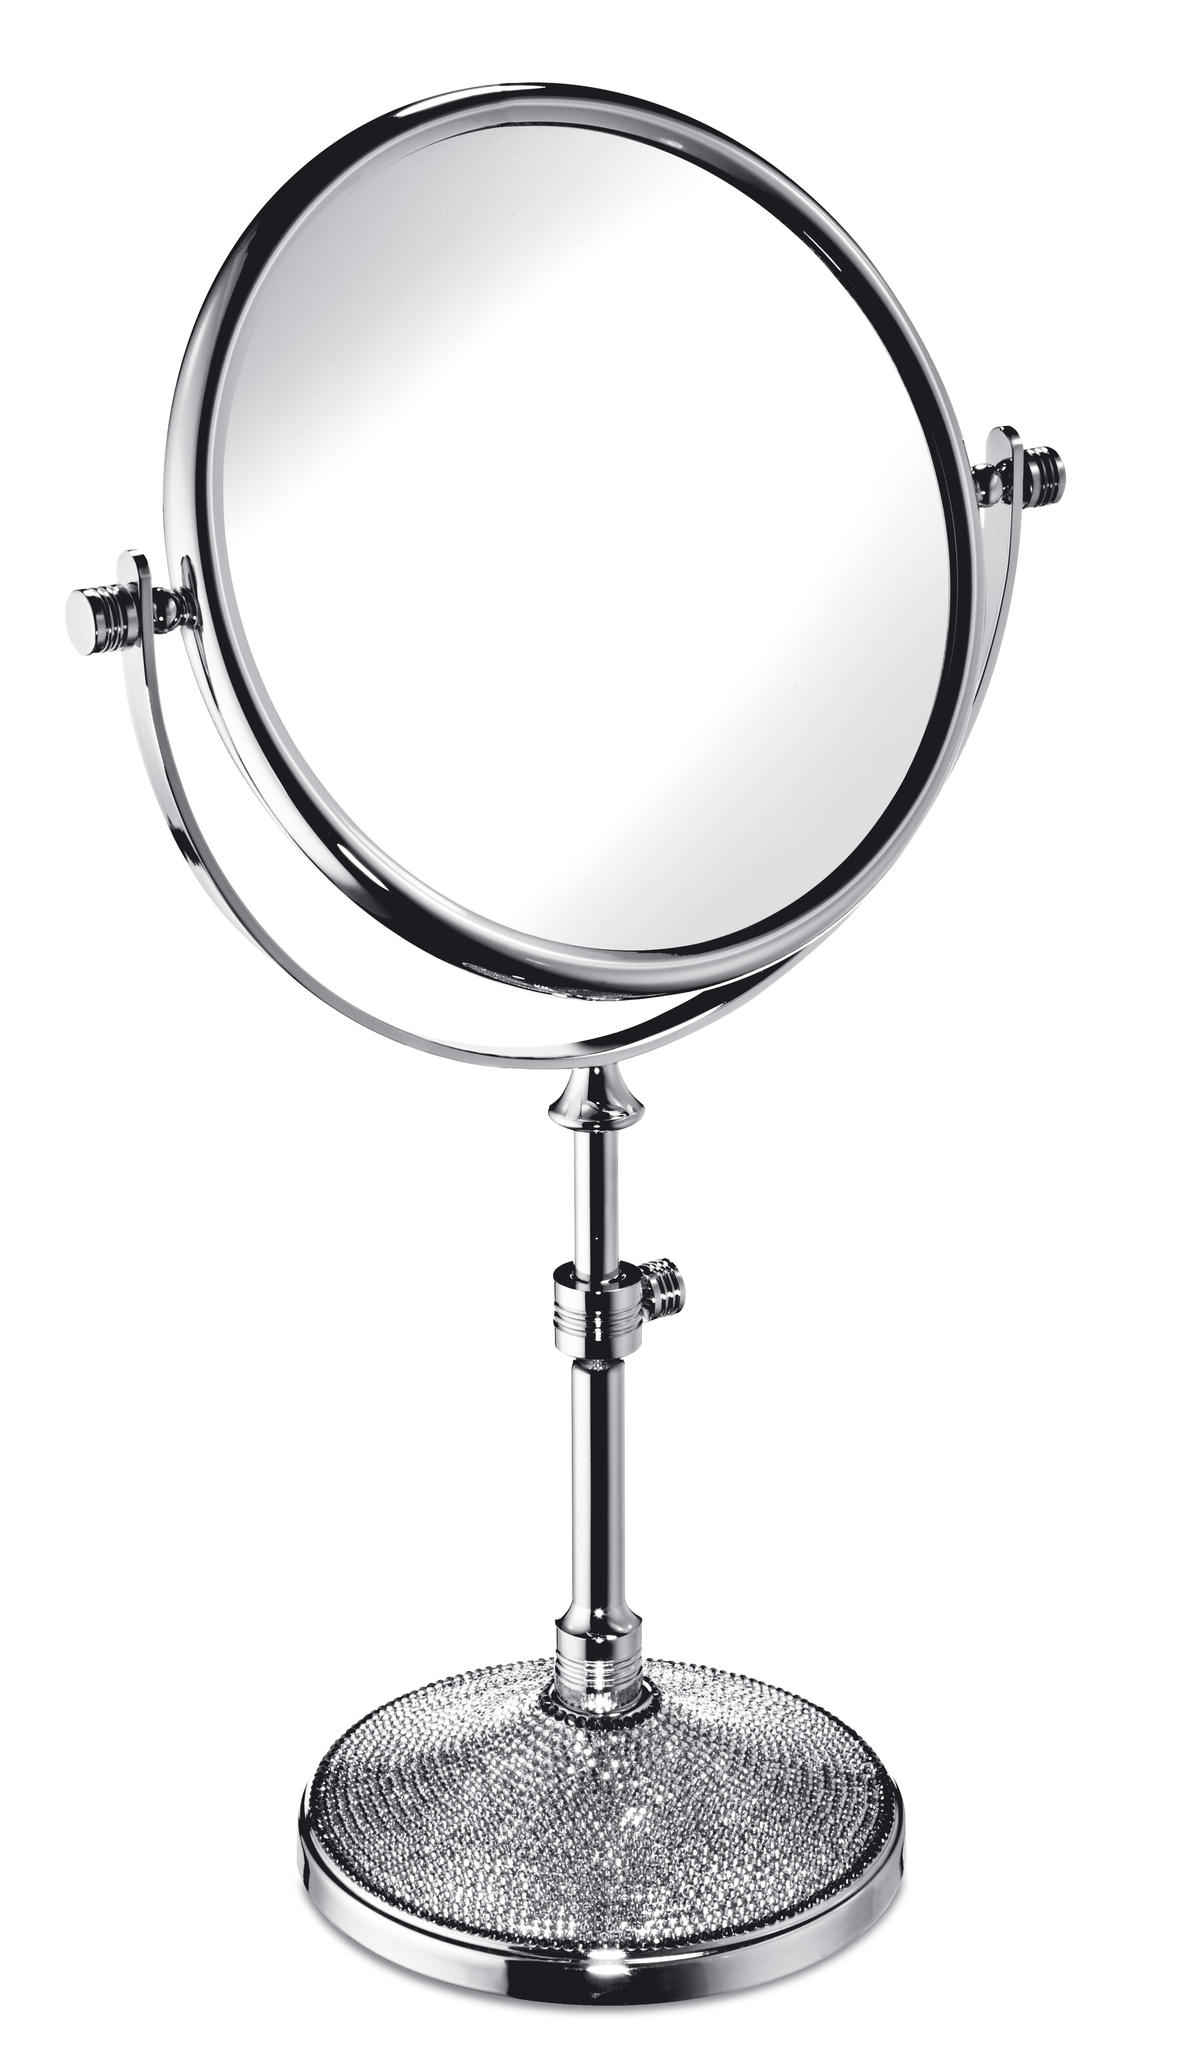 Зеркала Зеркало косметическое Windisch 99532CR 5X Starlight elitnoe-zerkalo-kosmeticheskoe-99532-starlight-ot-windisch-ispaniya-chrom.jpg